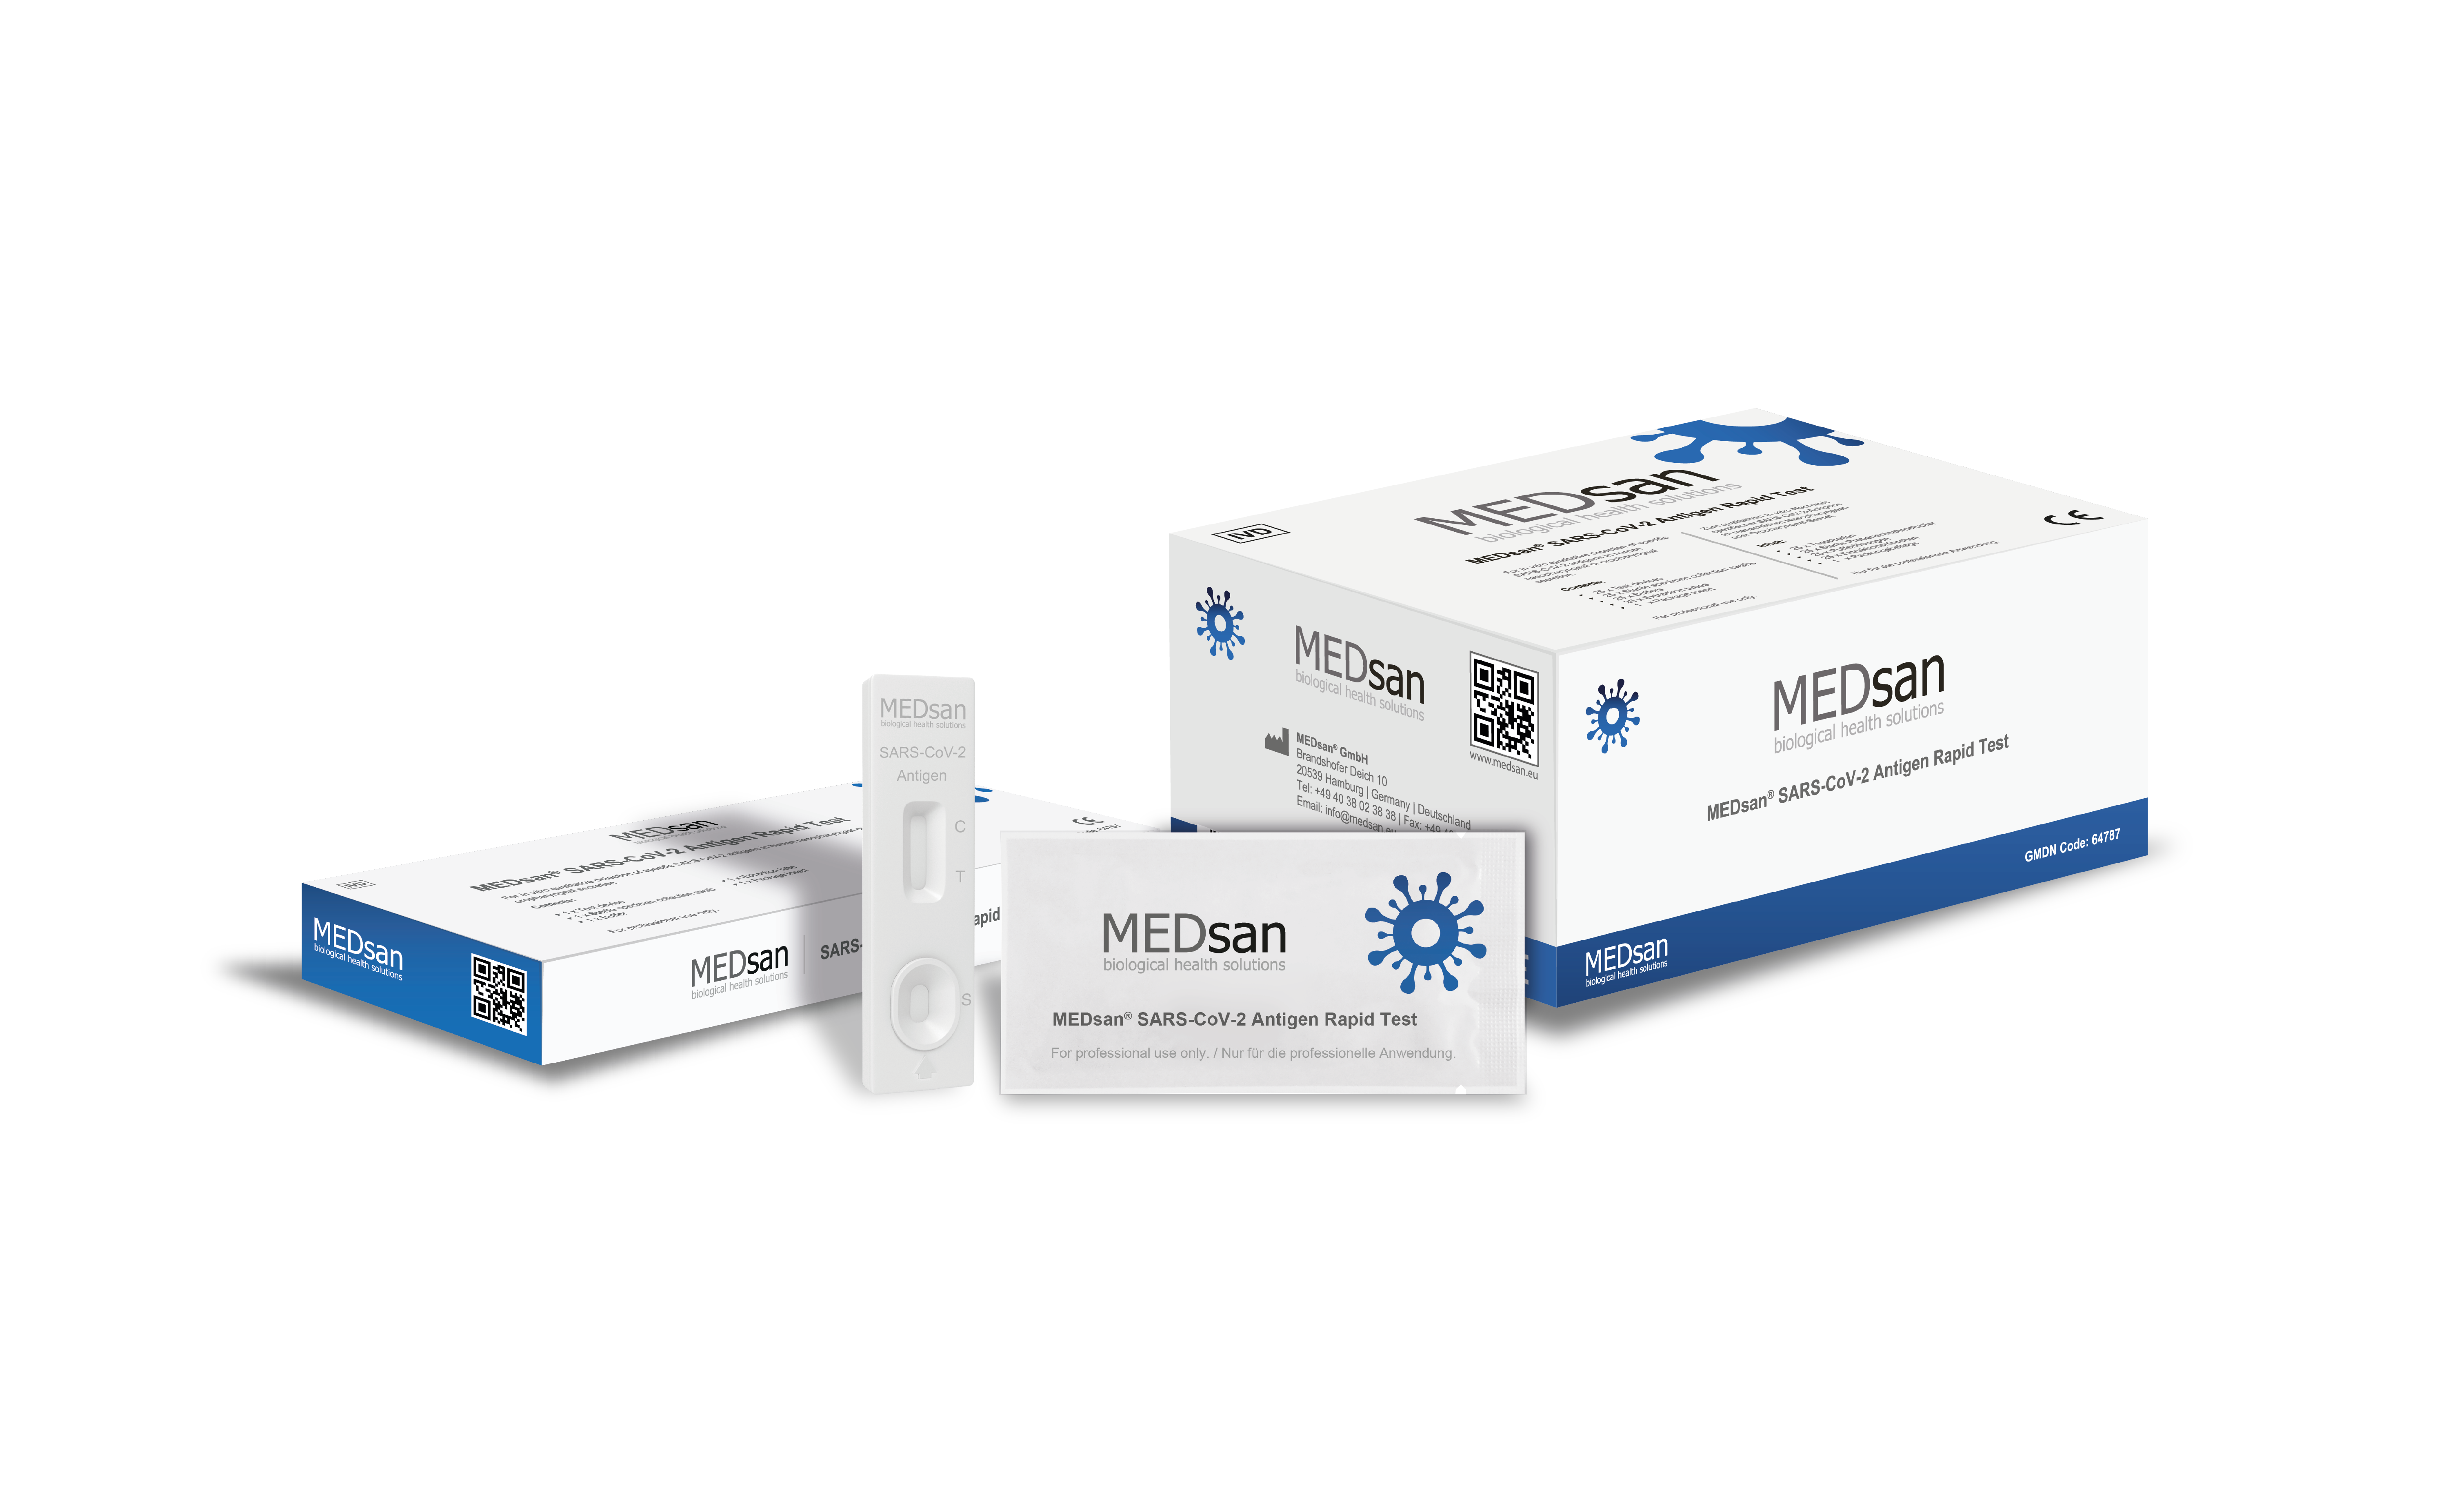 MEDsan®_SARS-CoV-2_Antigen_Rapid_Test-0